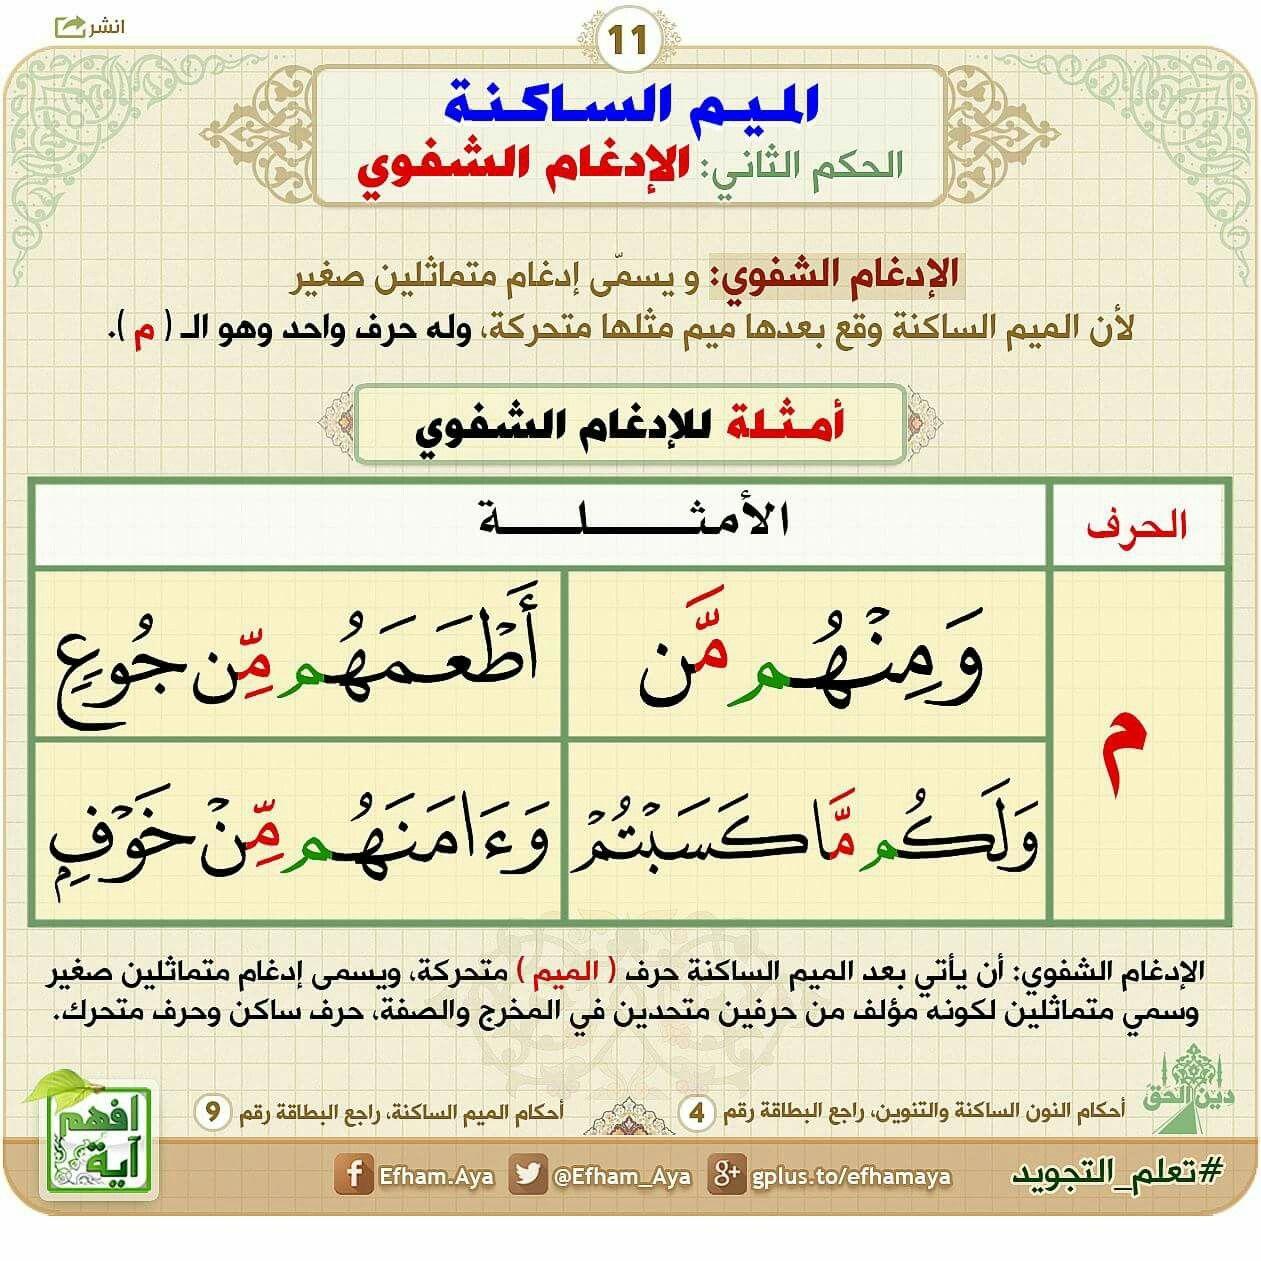 Pin By A On مبادئ علم التجويد Tajweed Quran Quran Tafseer Letter Recognition Worksheets